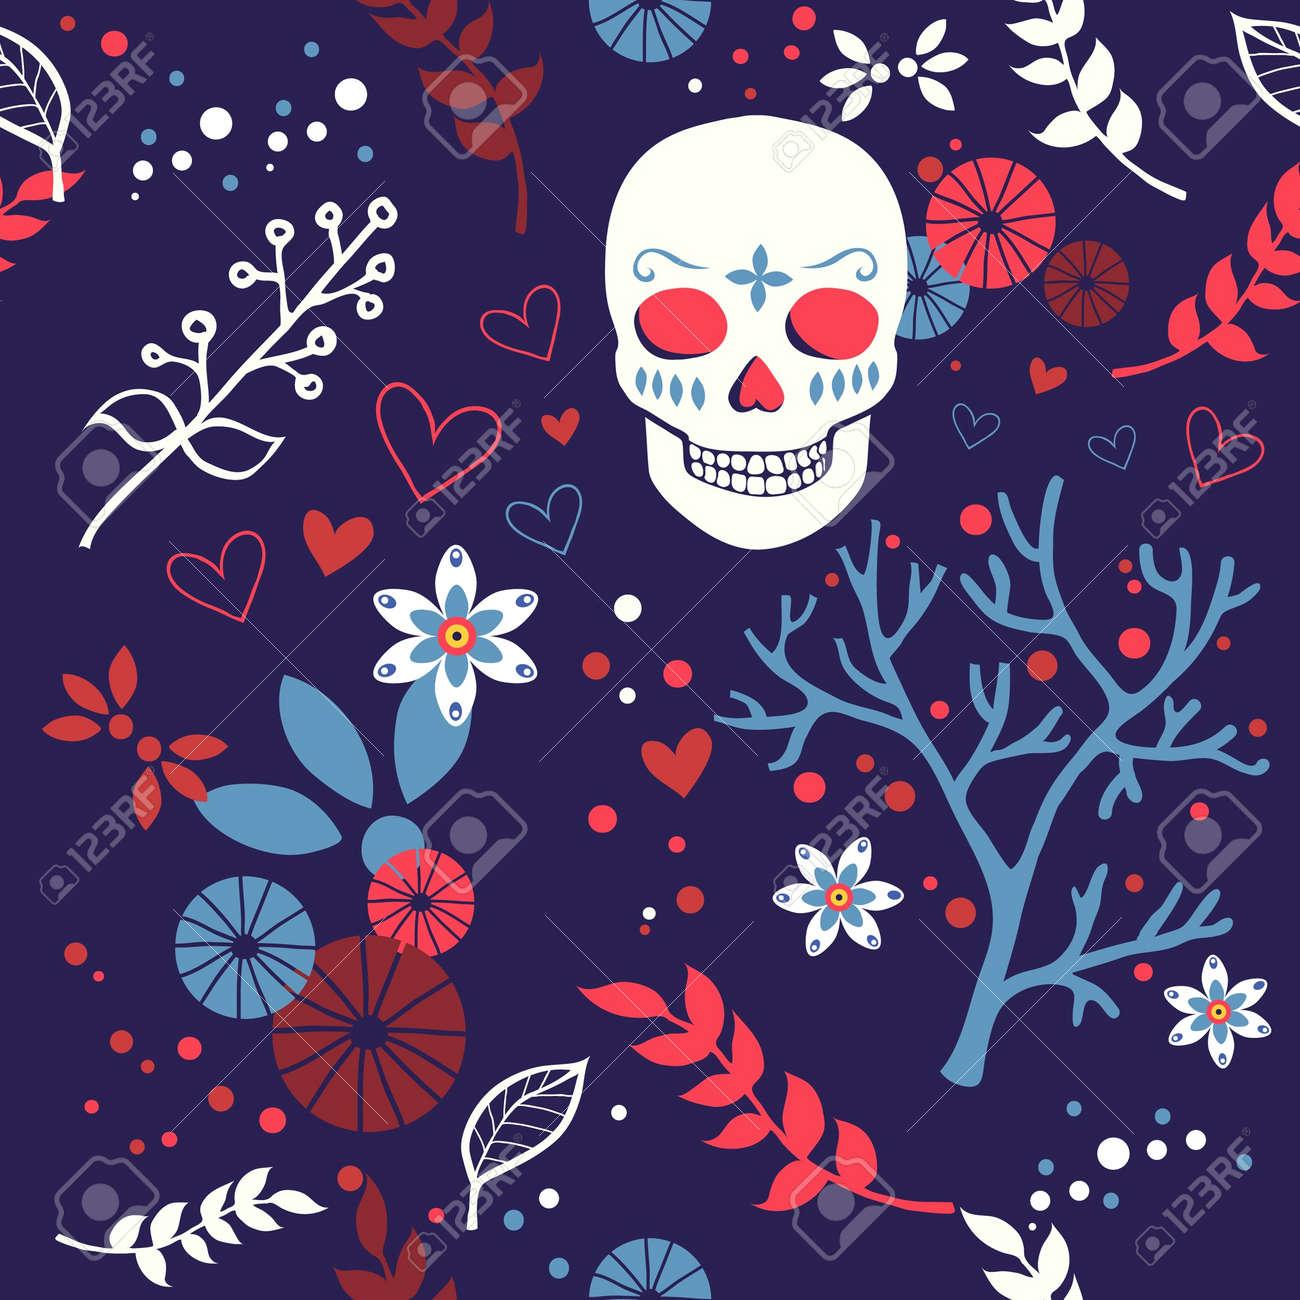 vector pattern with skulls Stock Vector - 21525336